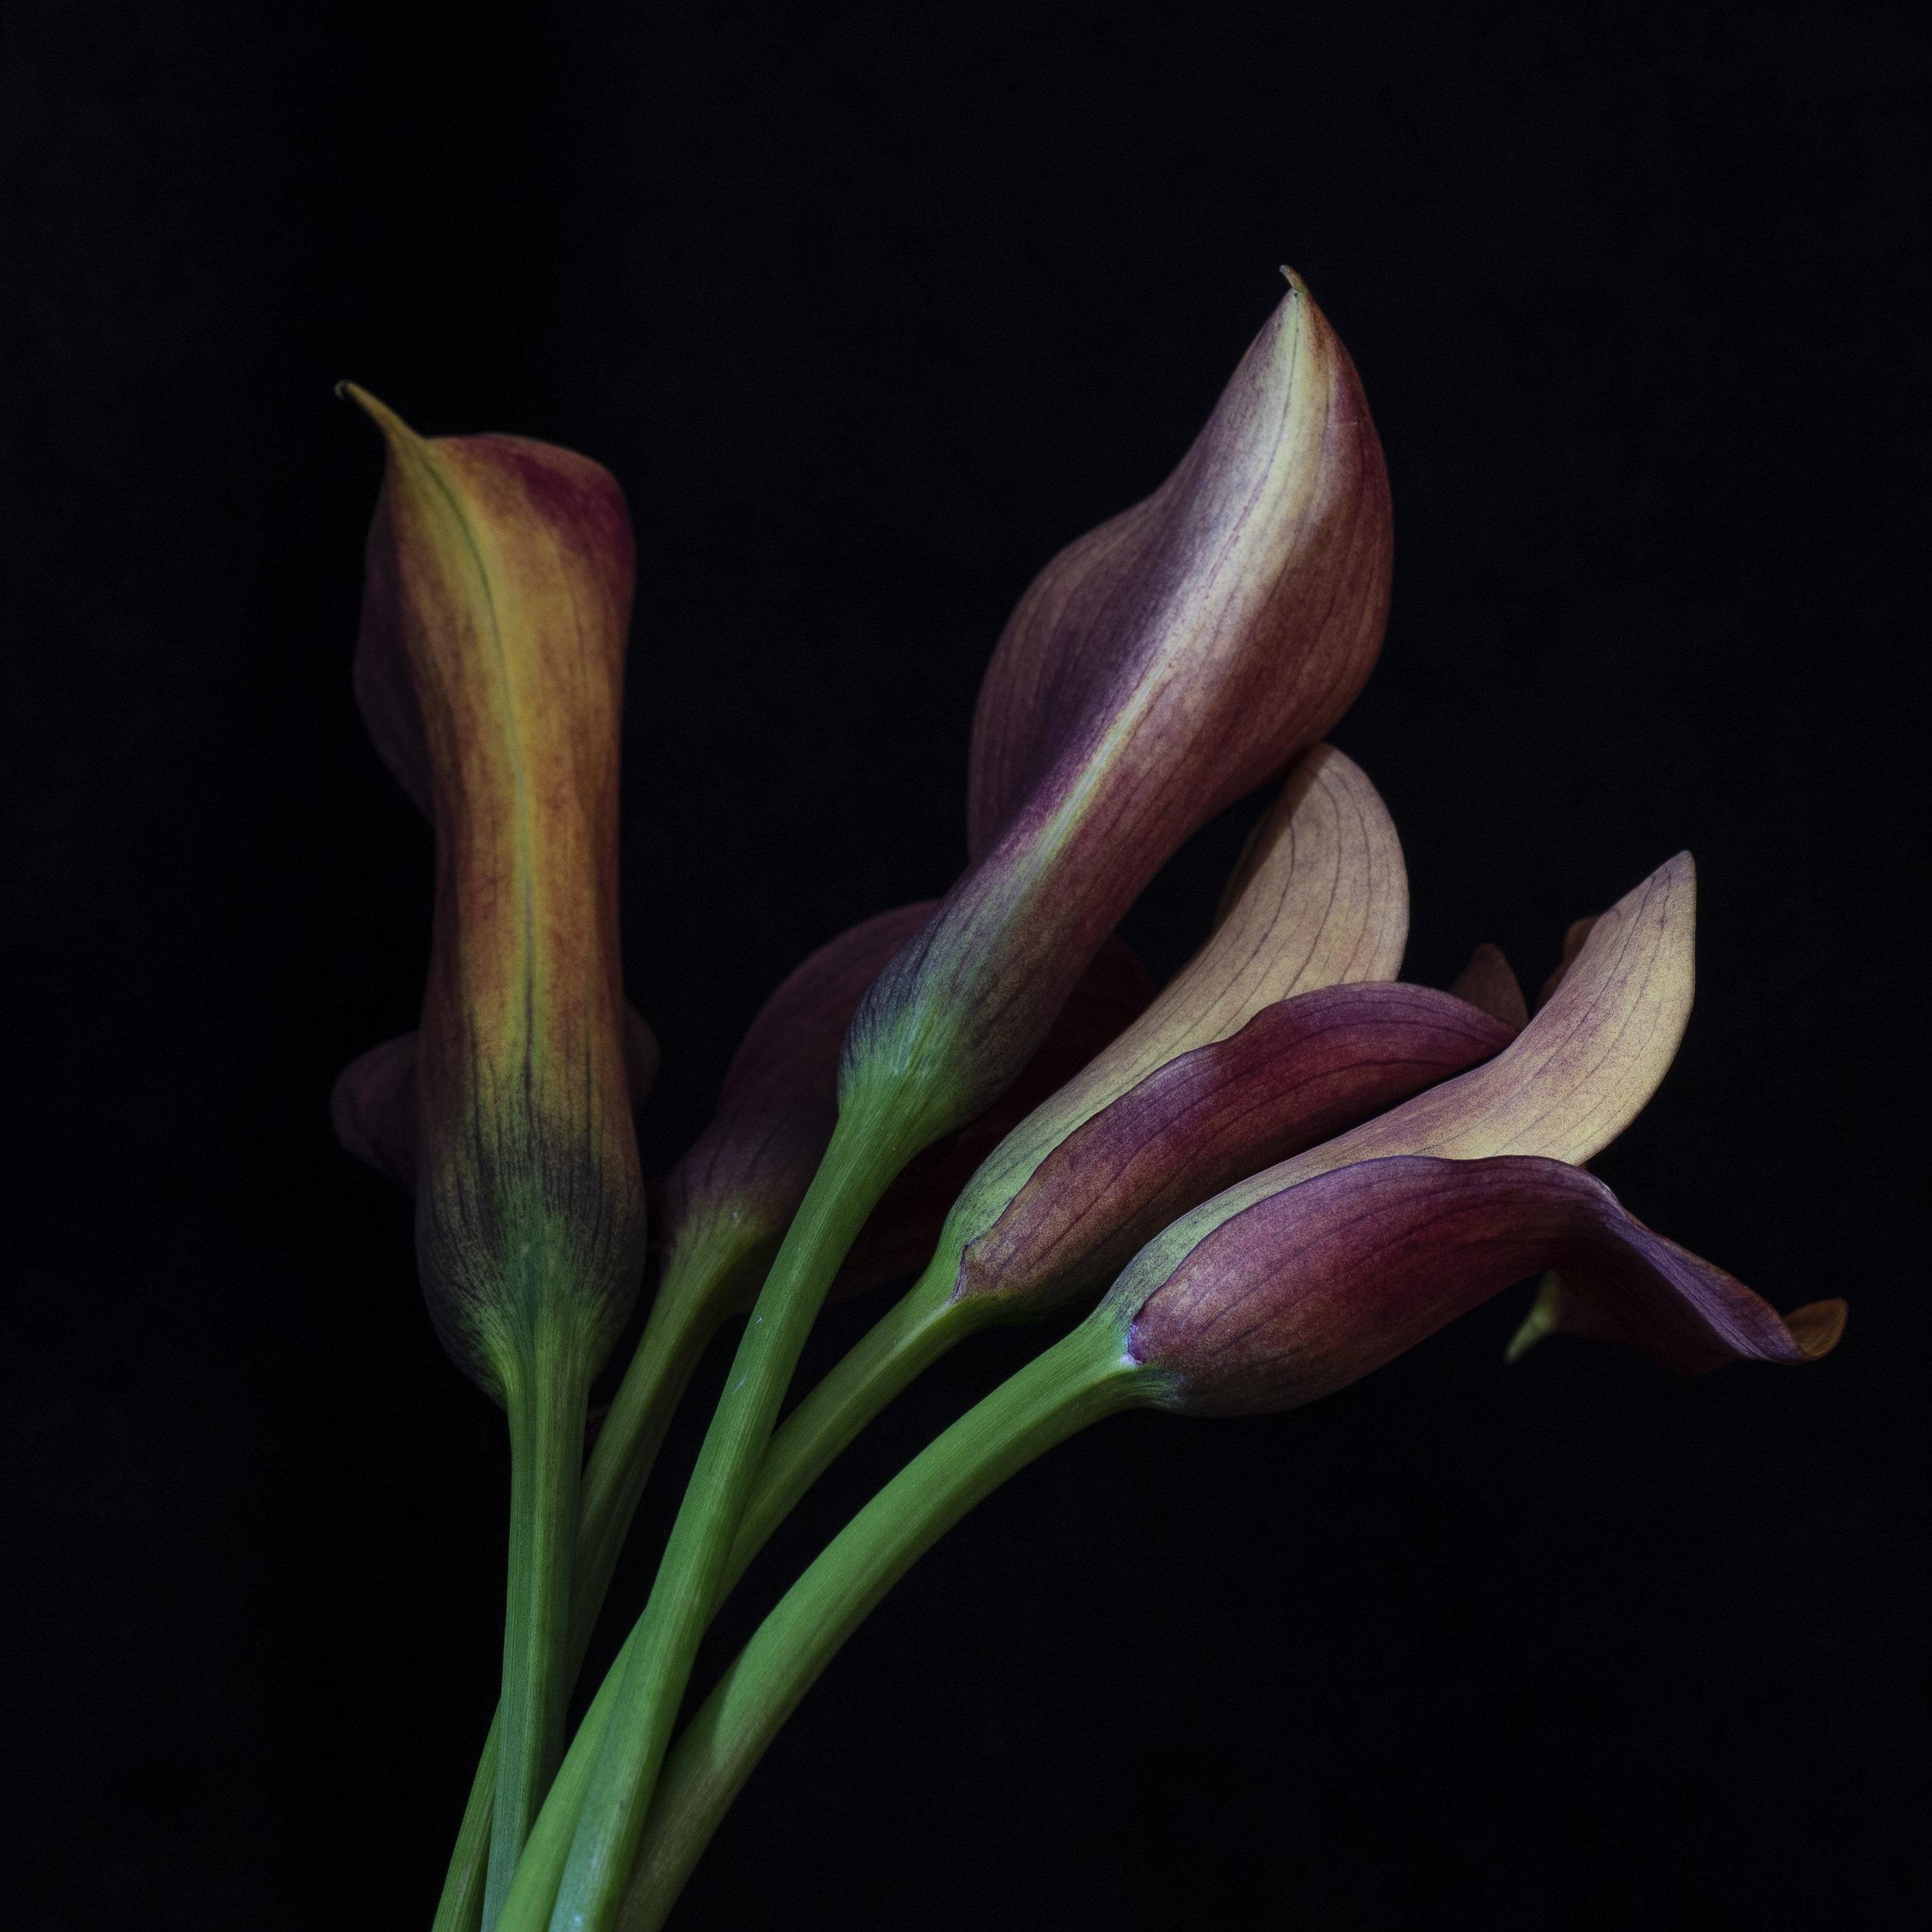 Durham_801_CallaLilly_Bunch1_Flower_7232018.jpg